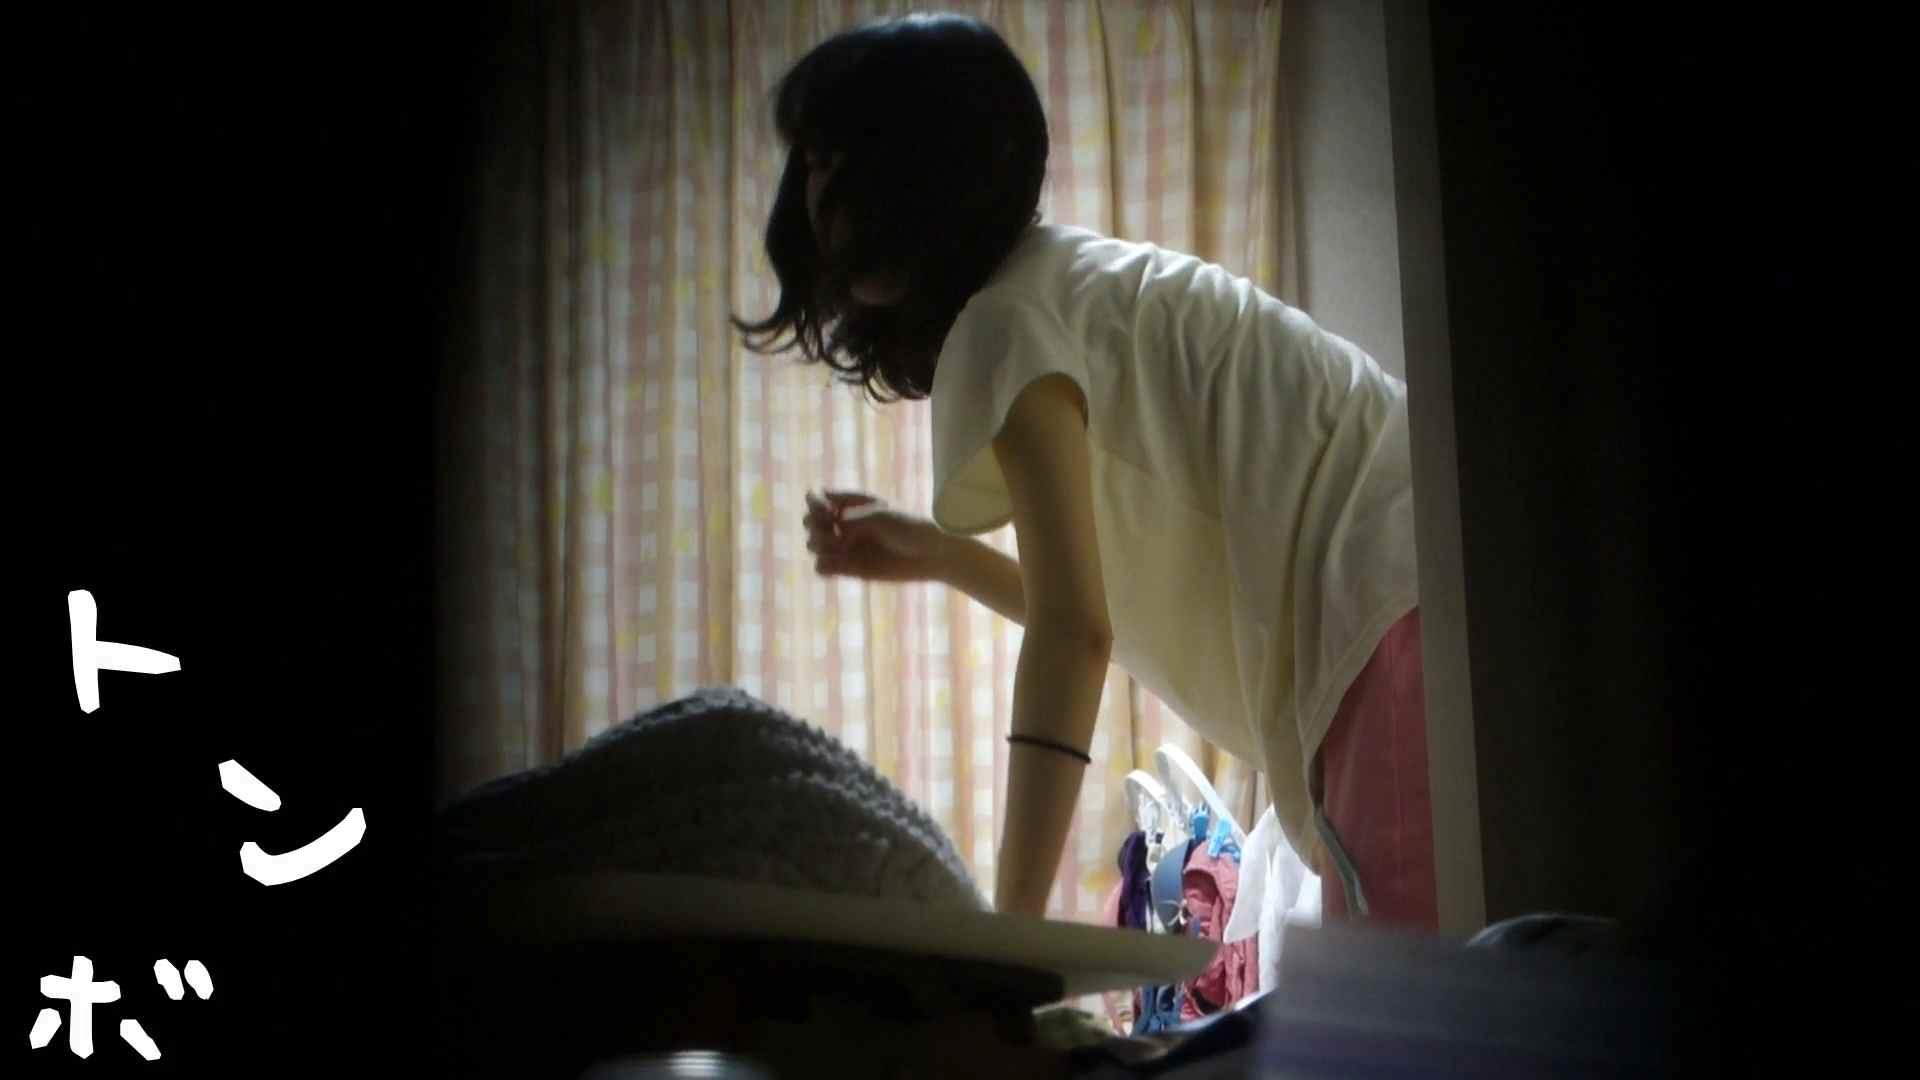 リアル盗撮 現役女子大生の私生活③ 細身  104PIX 74